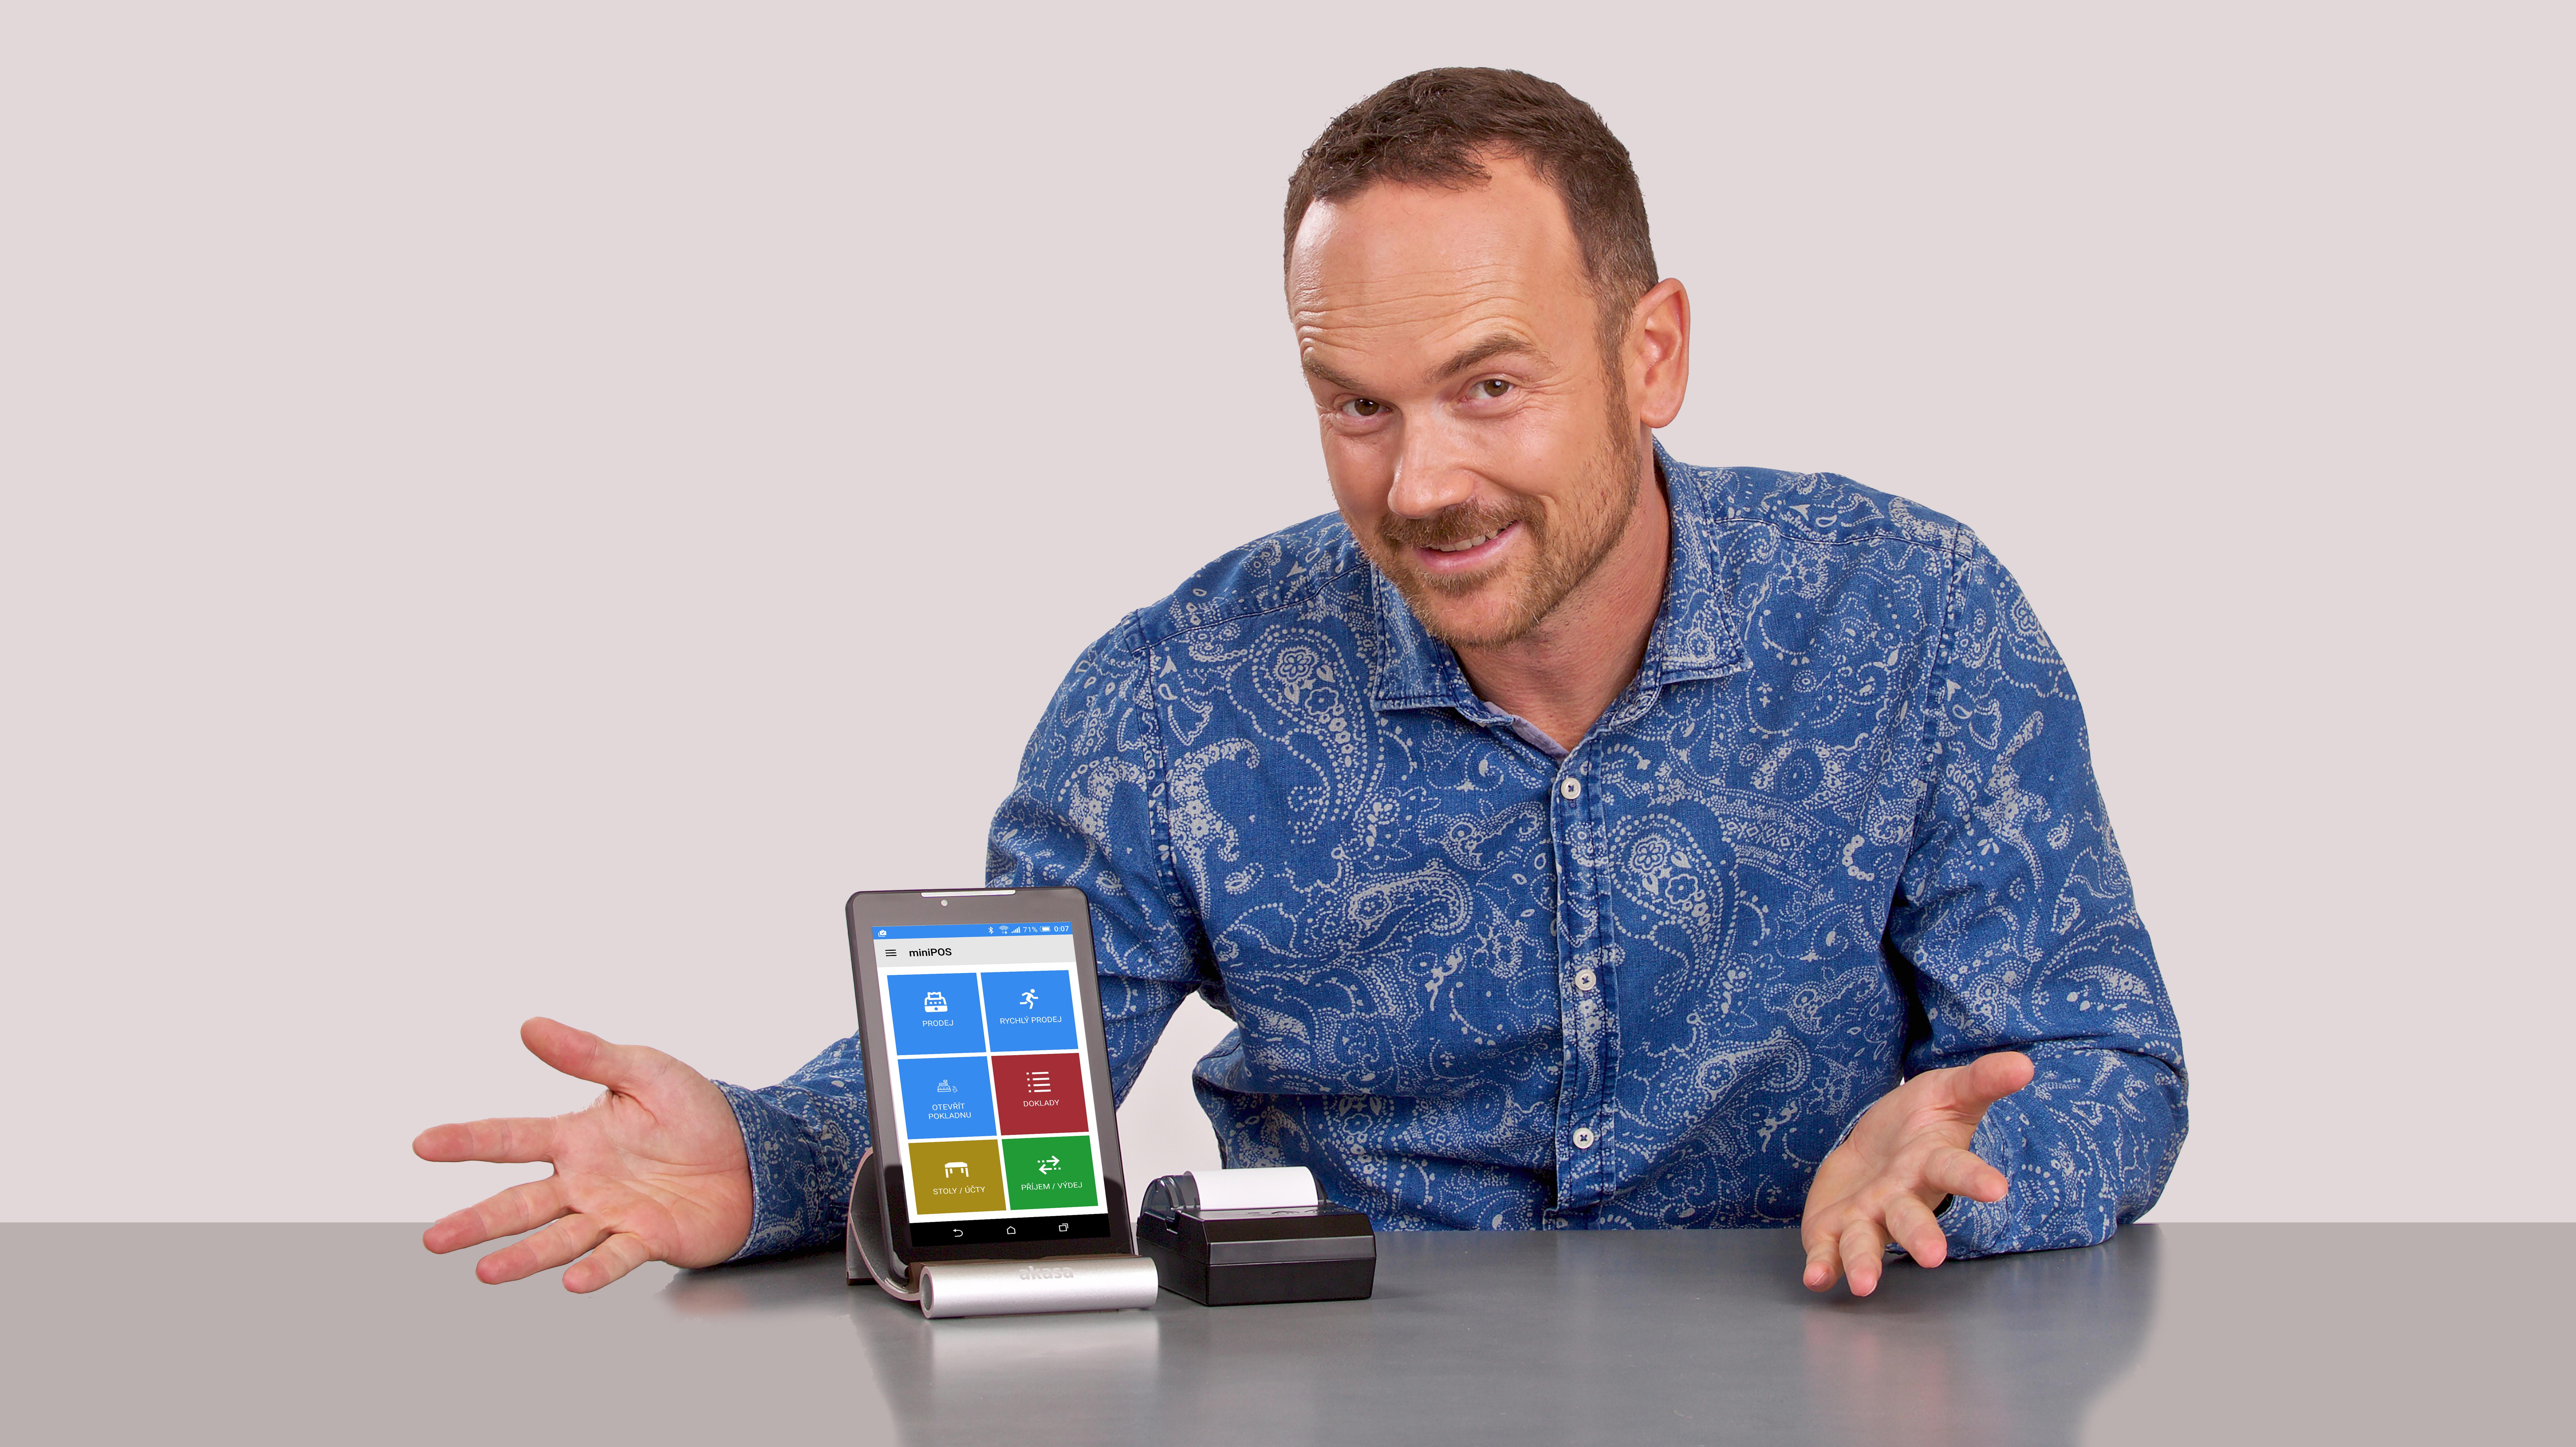 Pokladní systémy miniPOS postavené na Androidu. Martin Pavlík a tablet s aplikací miniPOS.